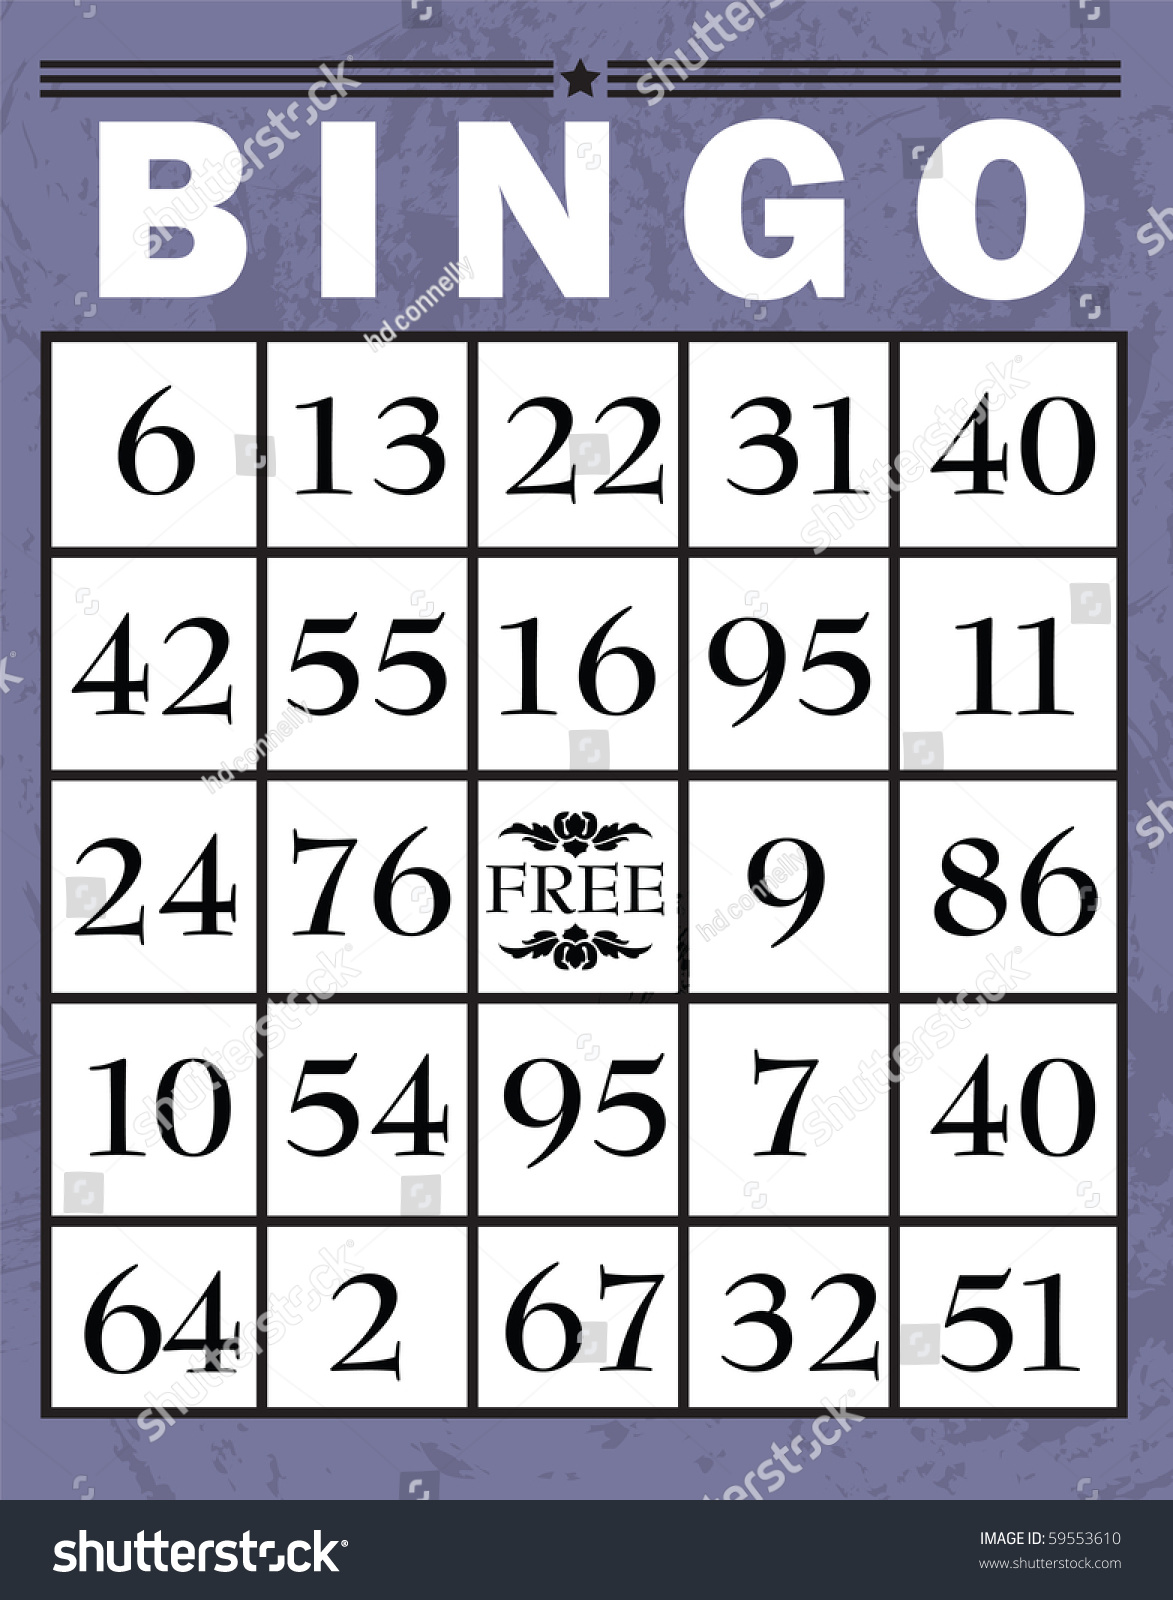 free bingo clipart downloads - photo #39